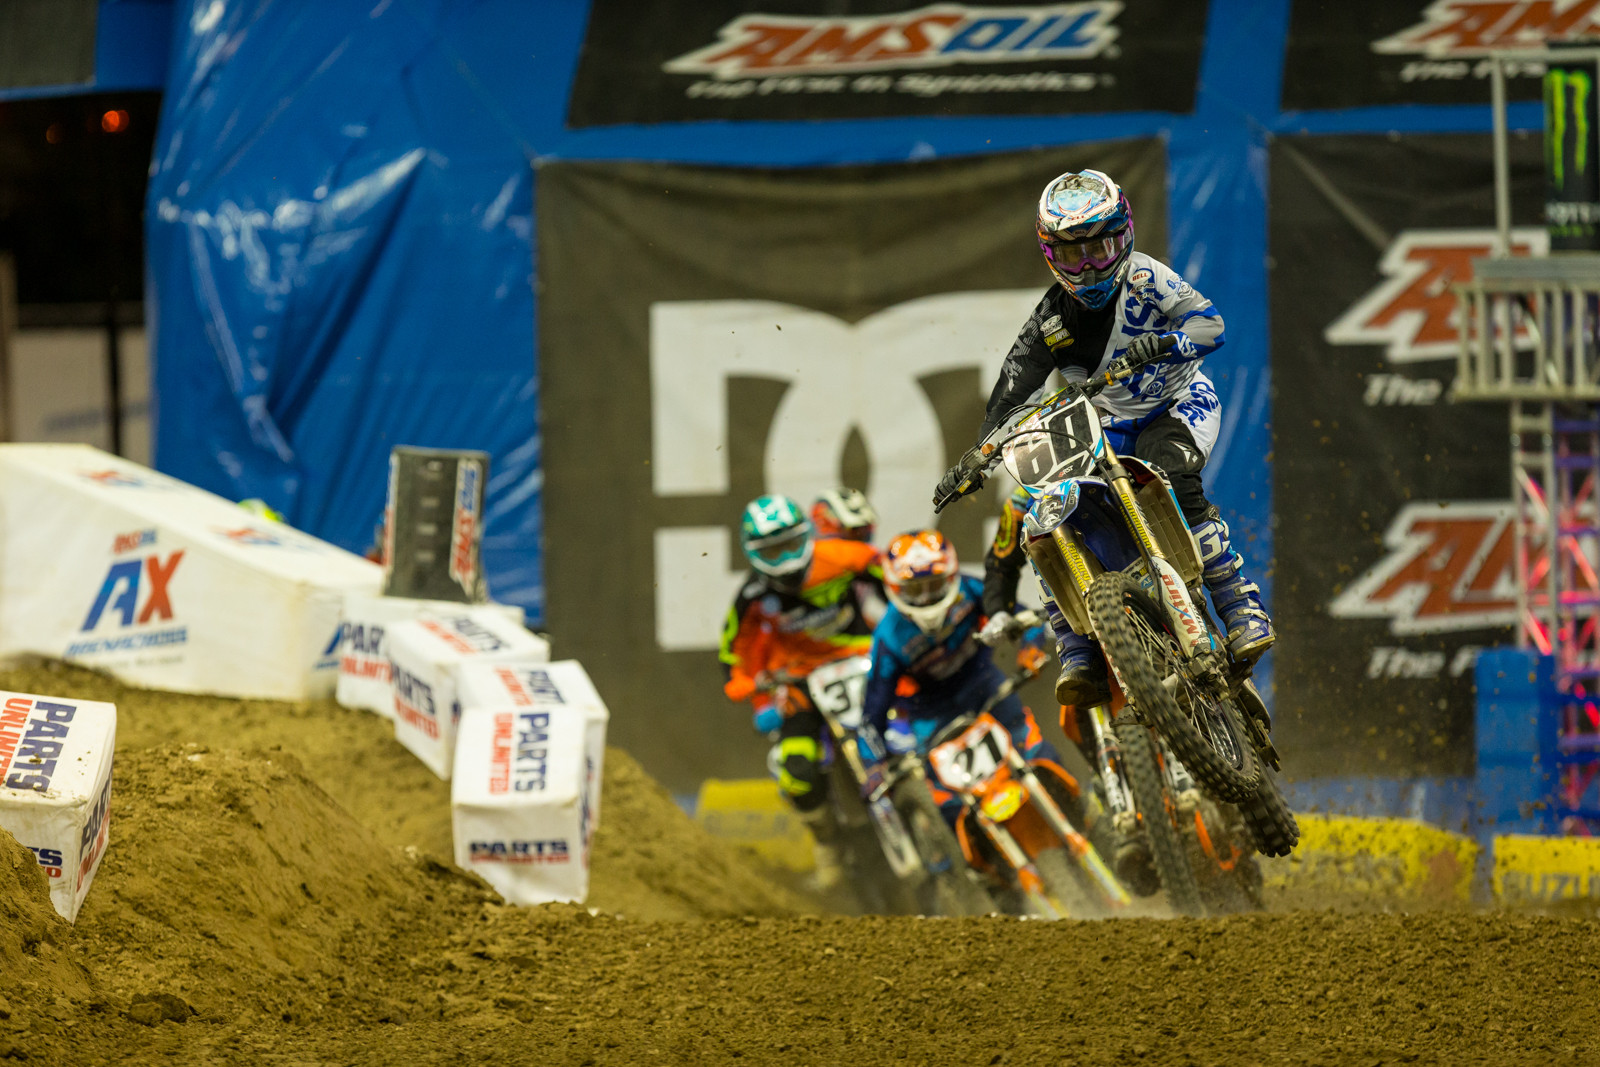 Lites Main Event Start - Photo Gallery: Ontario Arenacross - Saturday Night - Motocross Pictures - Vital MX